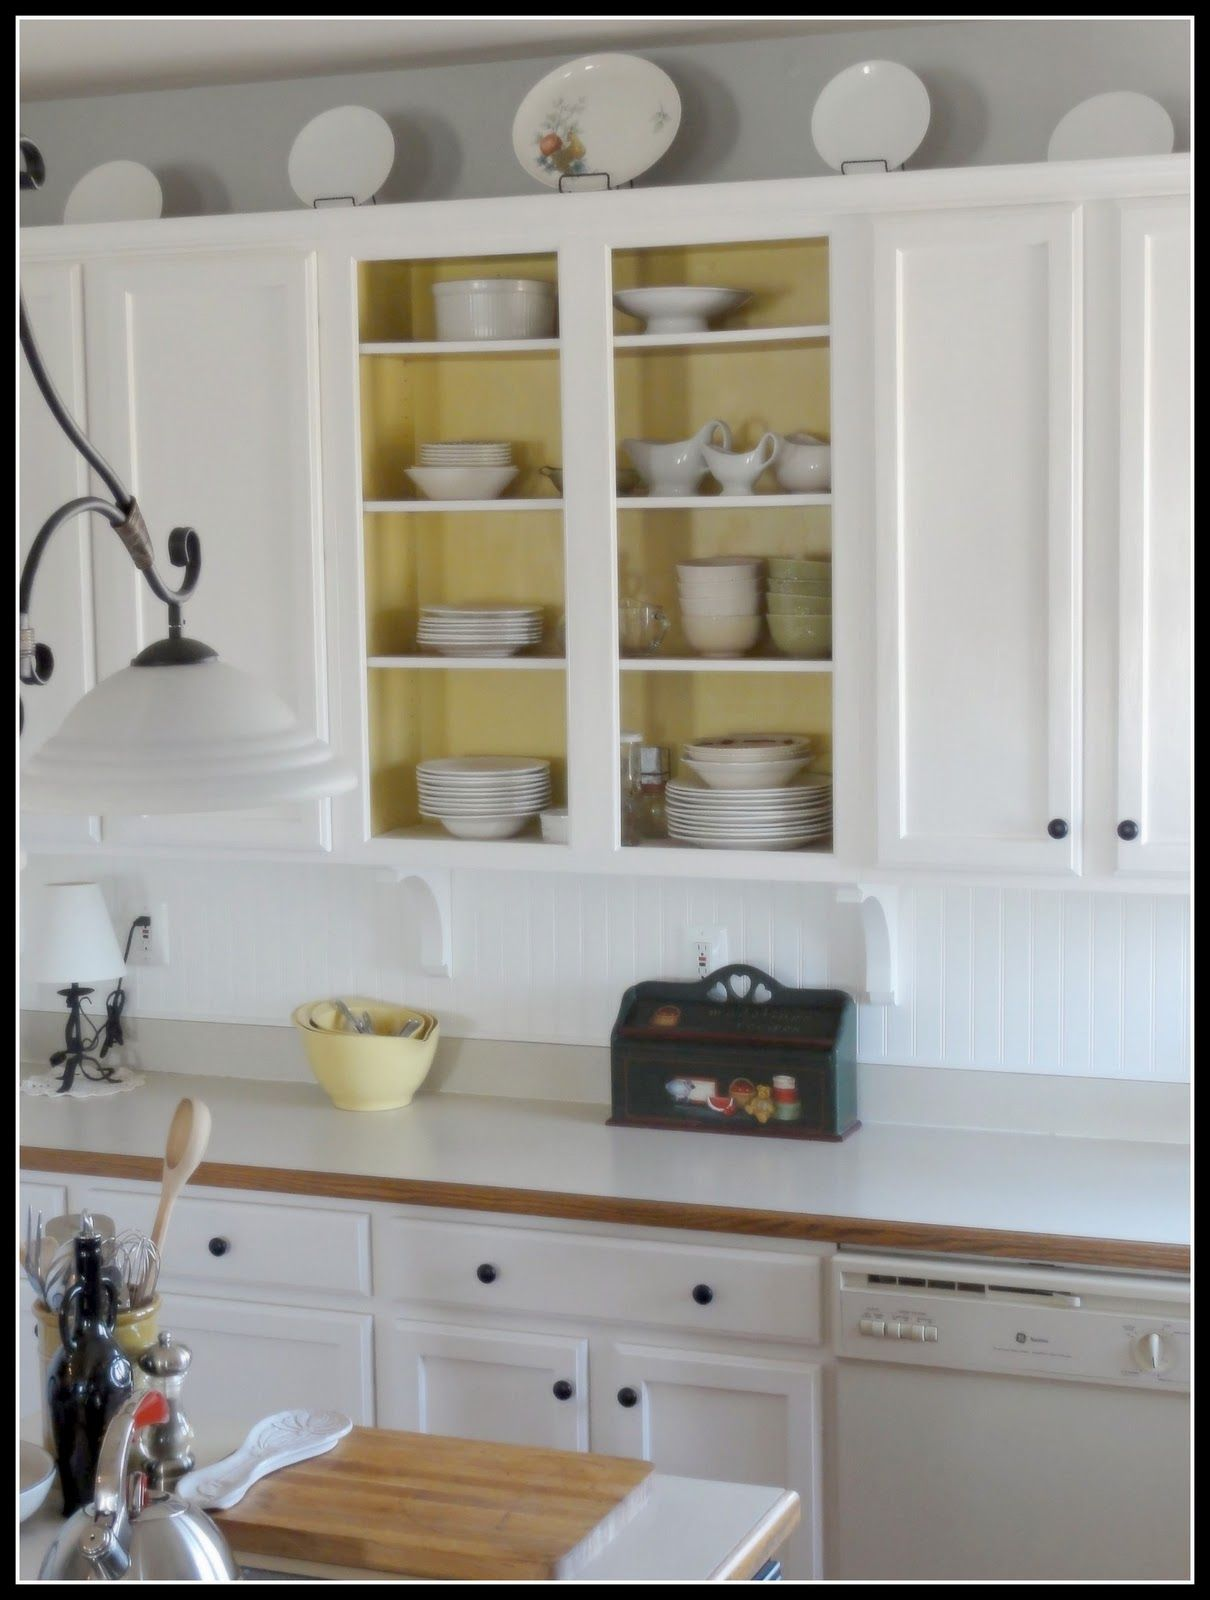 behr bleached linen paint chips pinterest behr linens and behr bleached linen inside kitchen cabinetsopen